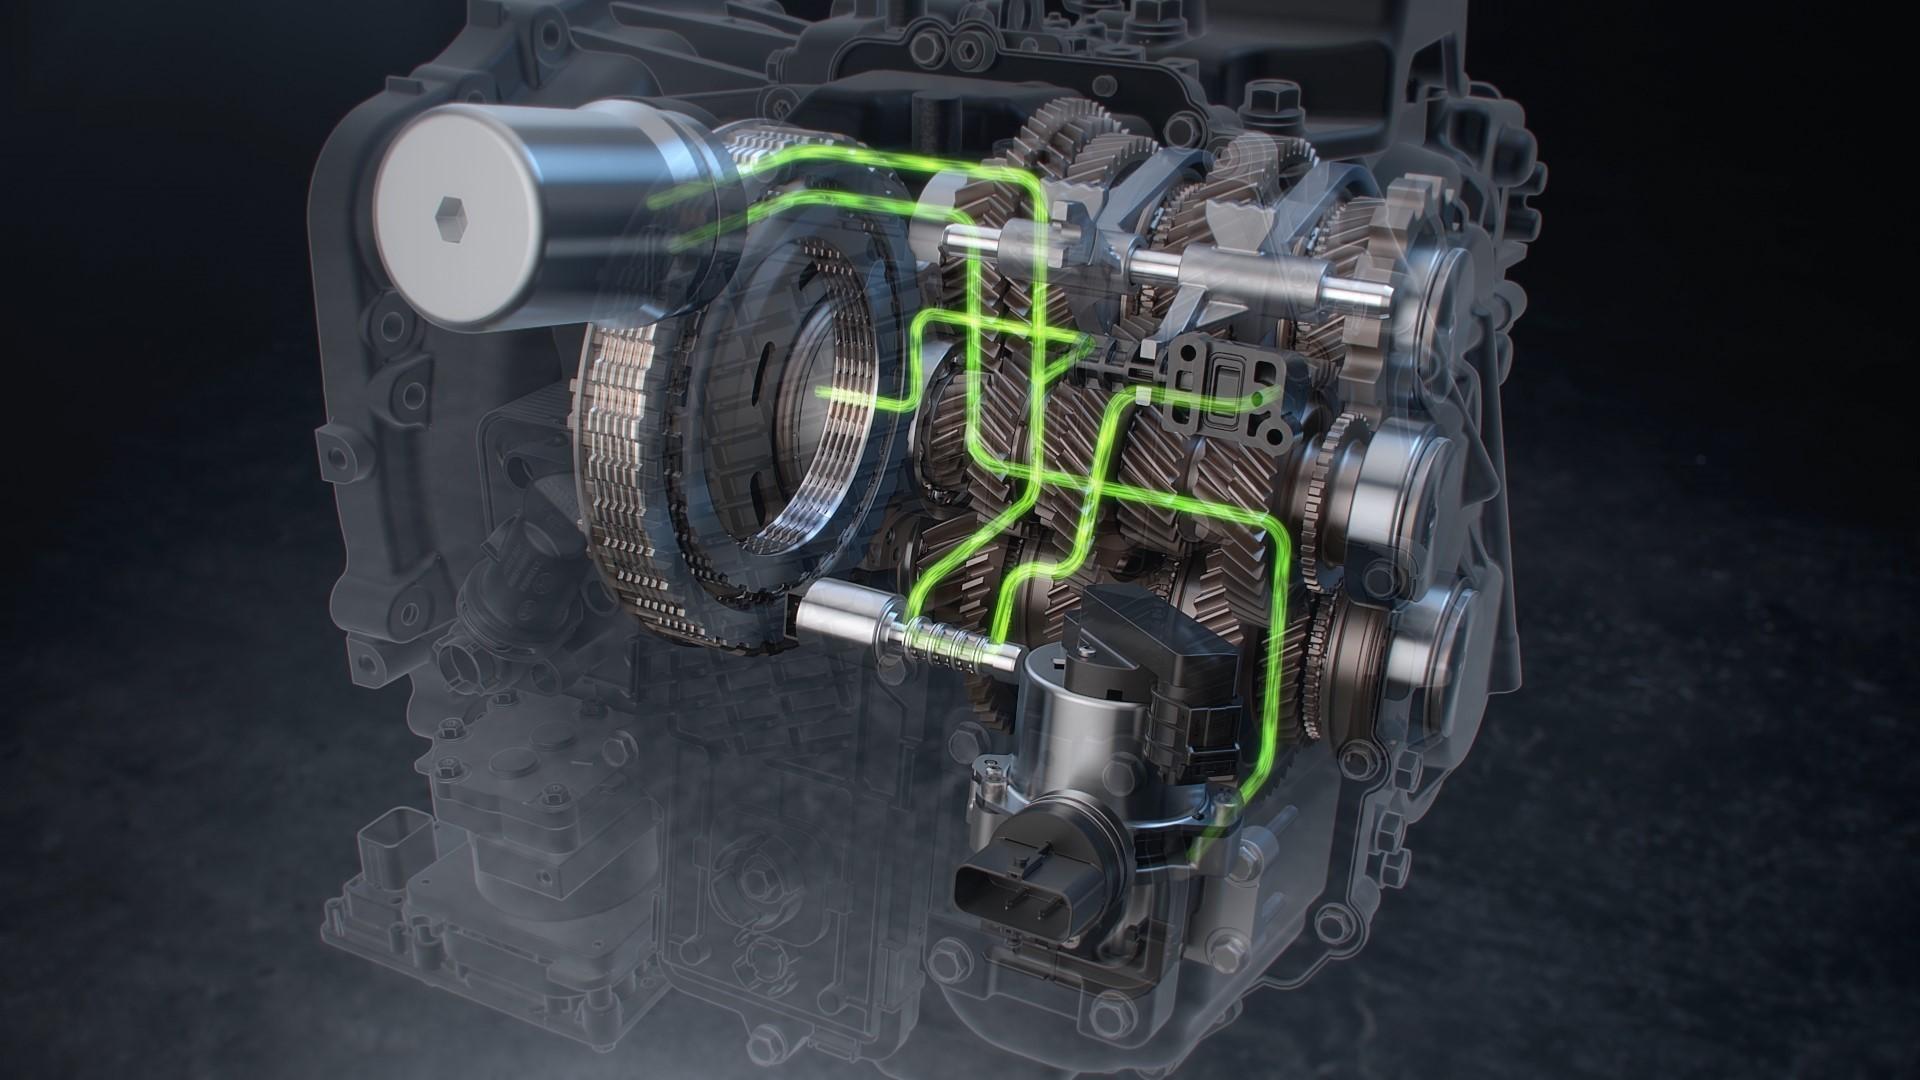 Kia announces new platform and powertrain details for next-generation Sorento - Image 3